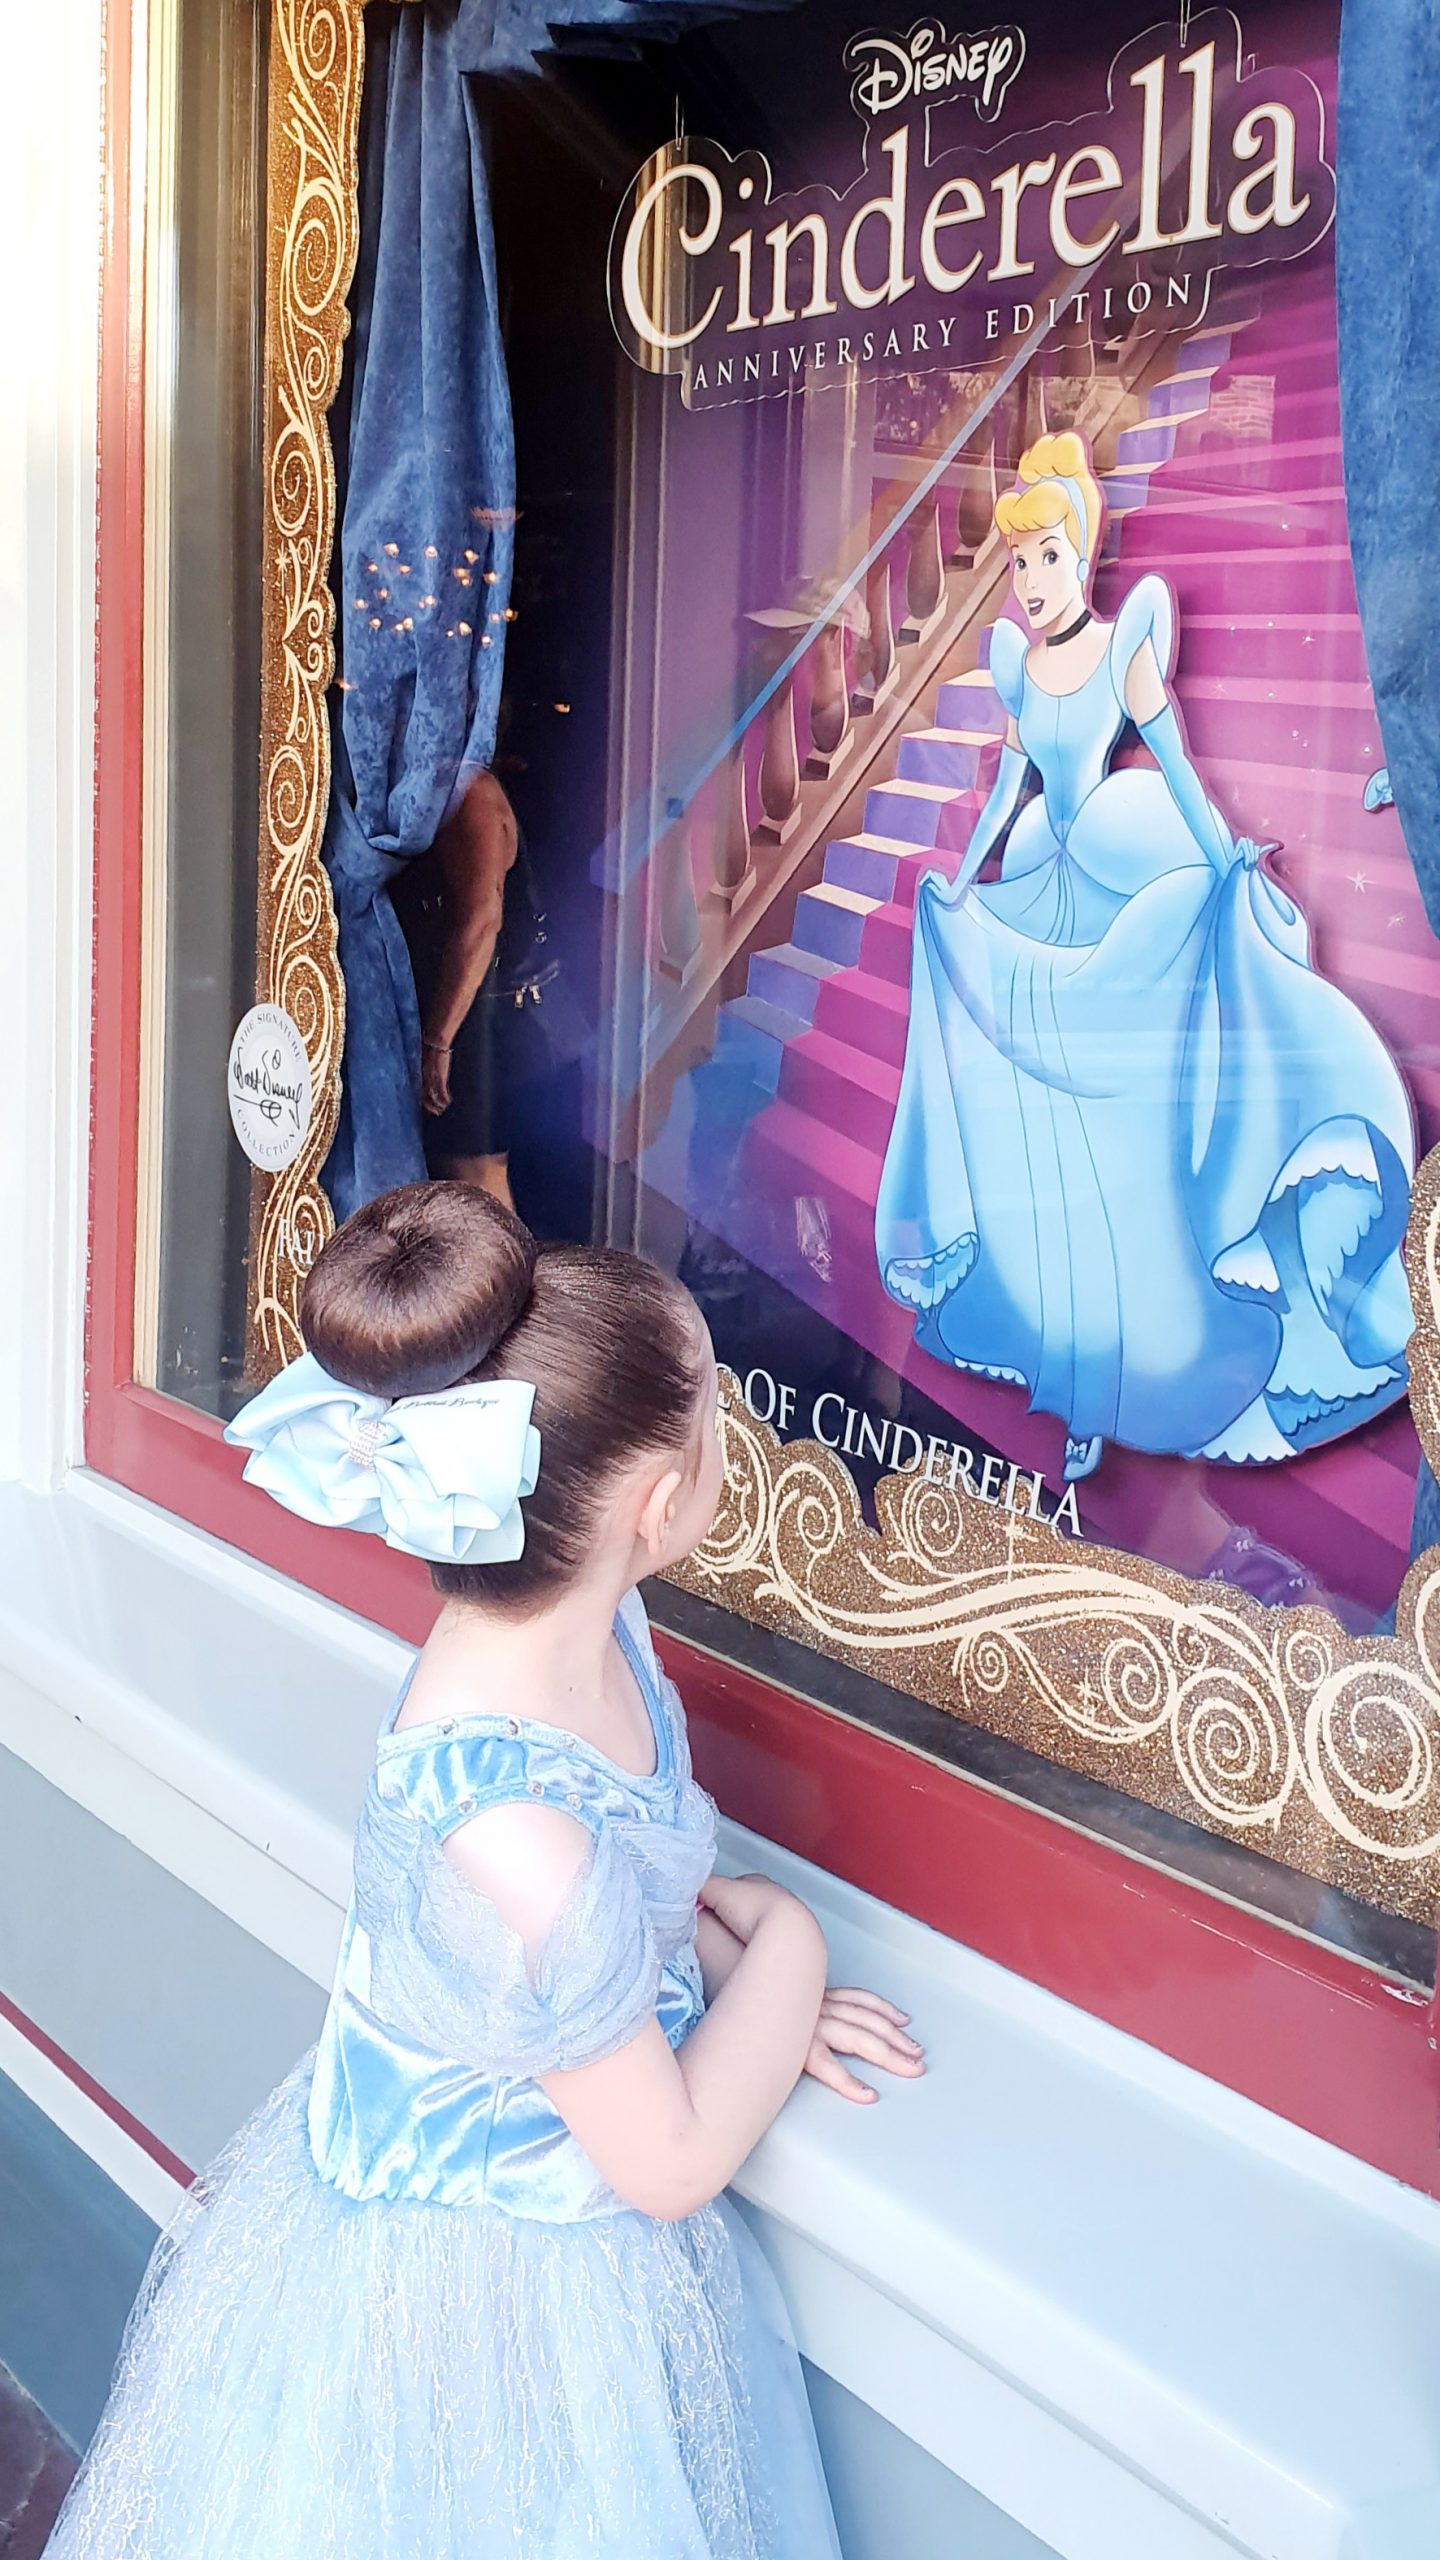 Disneyland Main Street U.S.A.